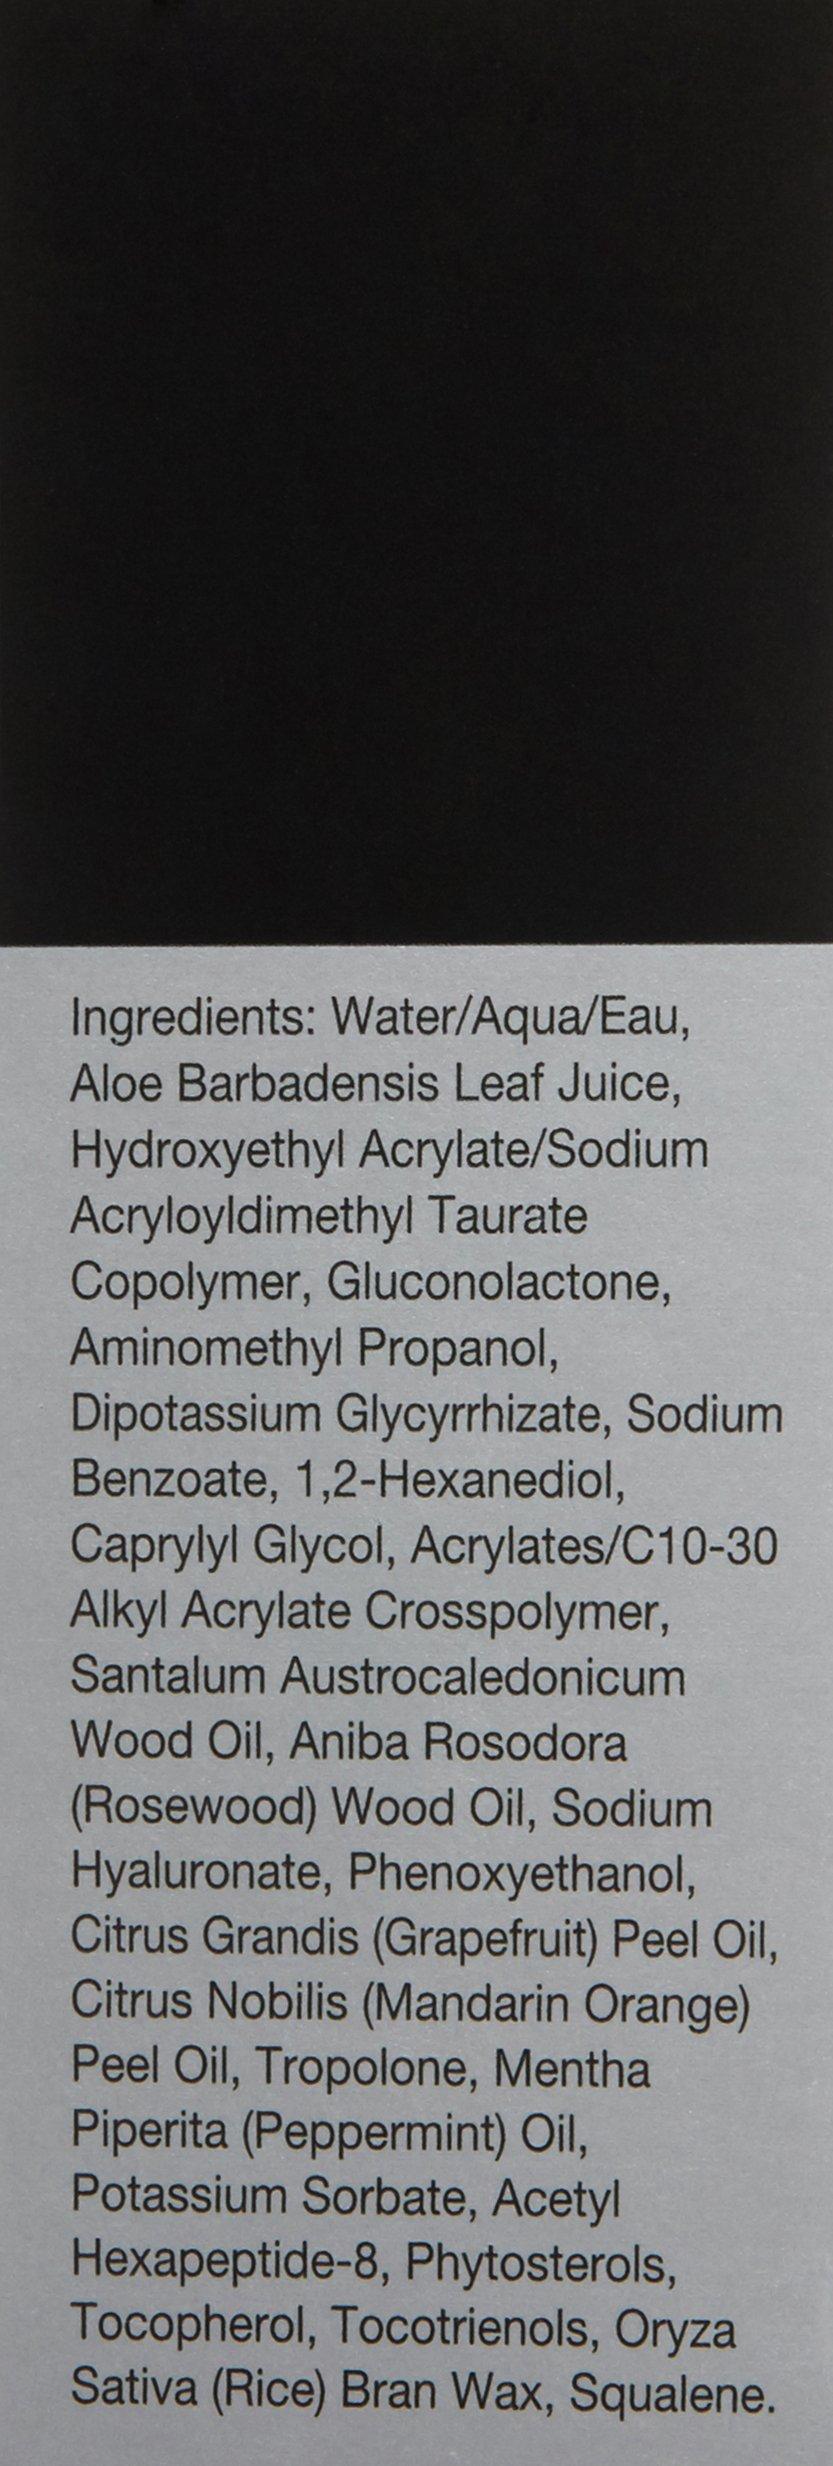 PCA SKIN Exlinea Peptide Smoothing Serum, 1 fl. oz. by PCA SKIN (Image #4)